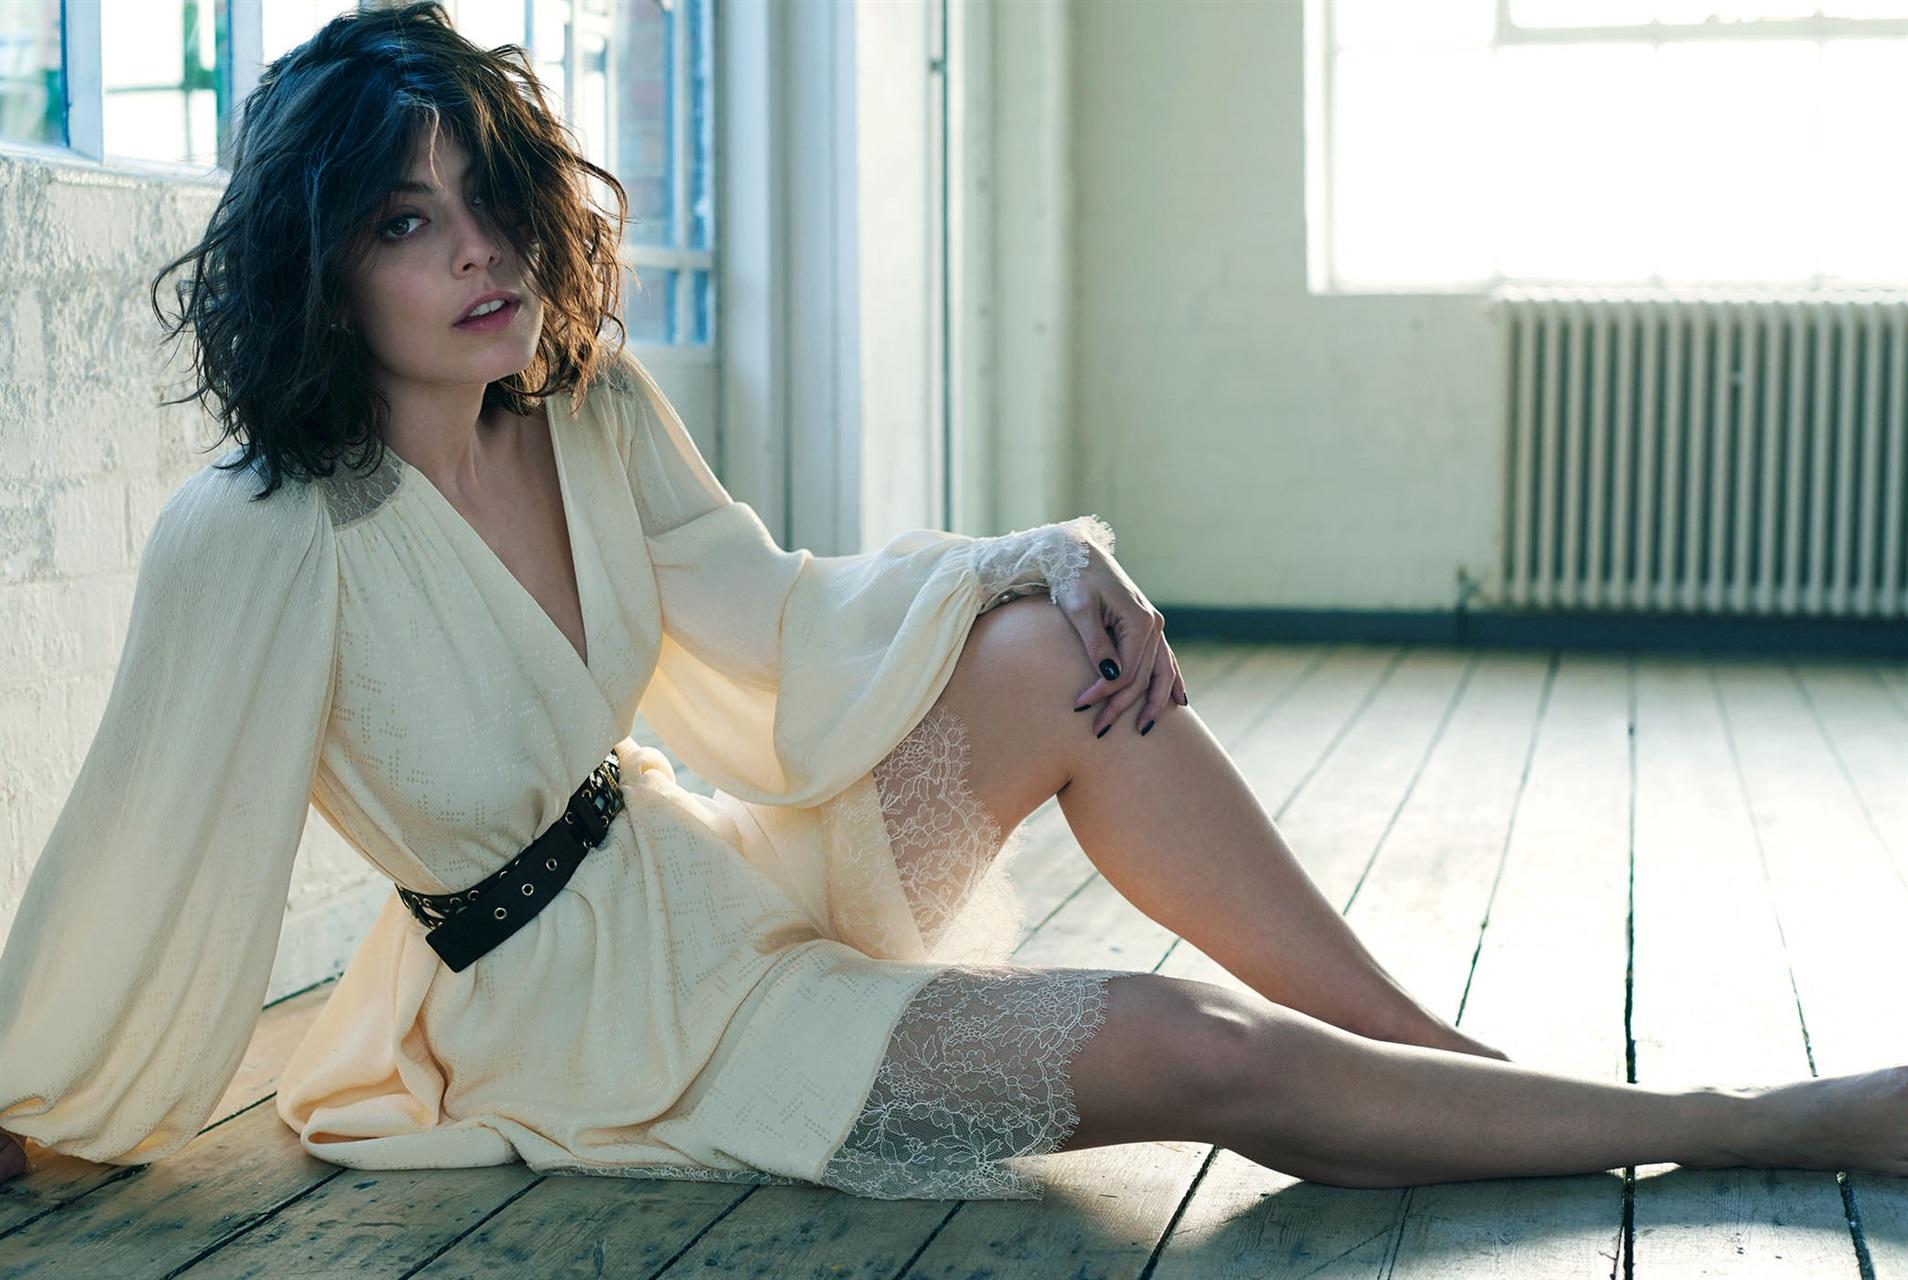 ADULT Corinna Kneuer nude (78 photo), Paparazzi Celebrites fotos